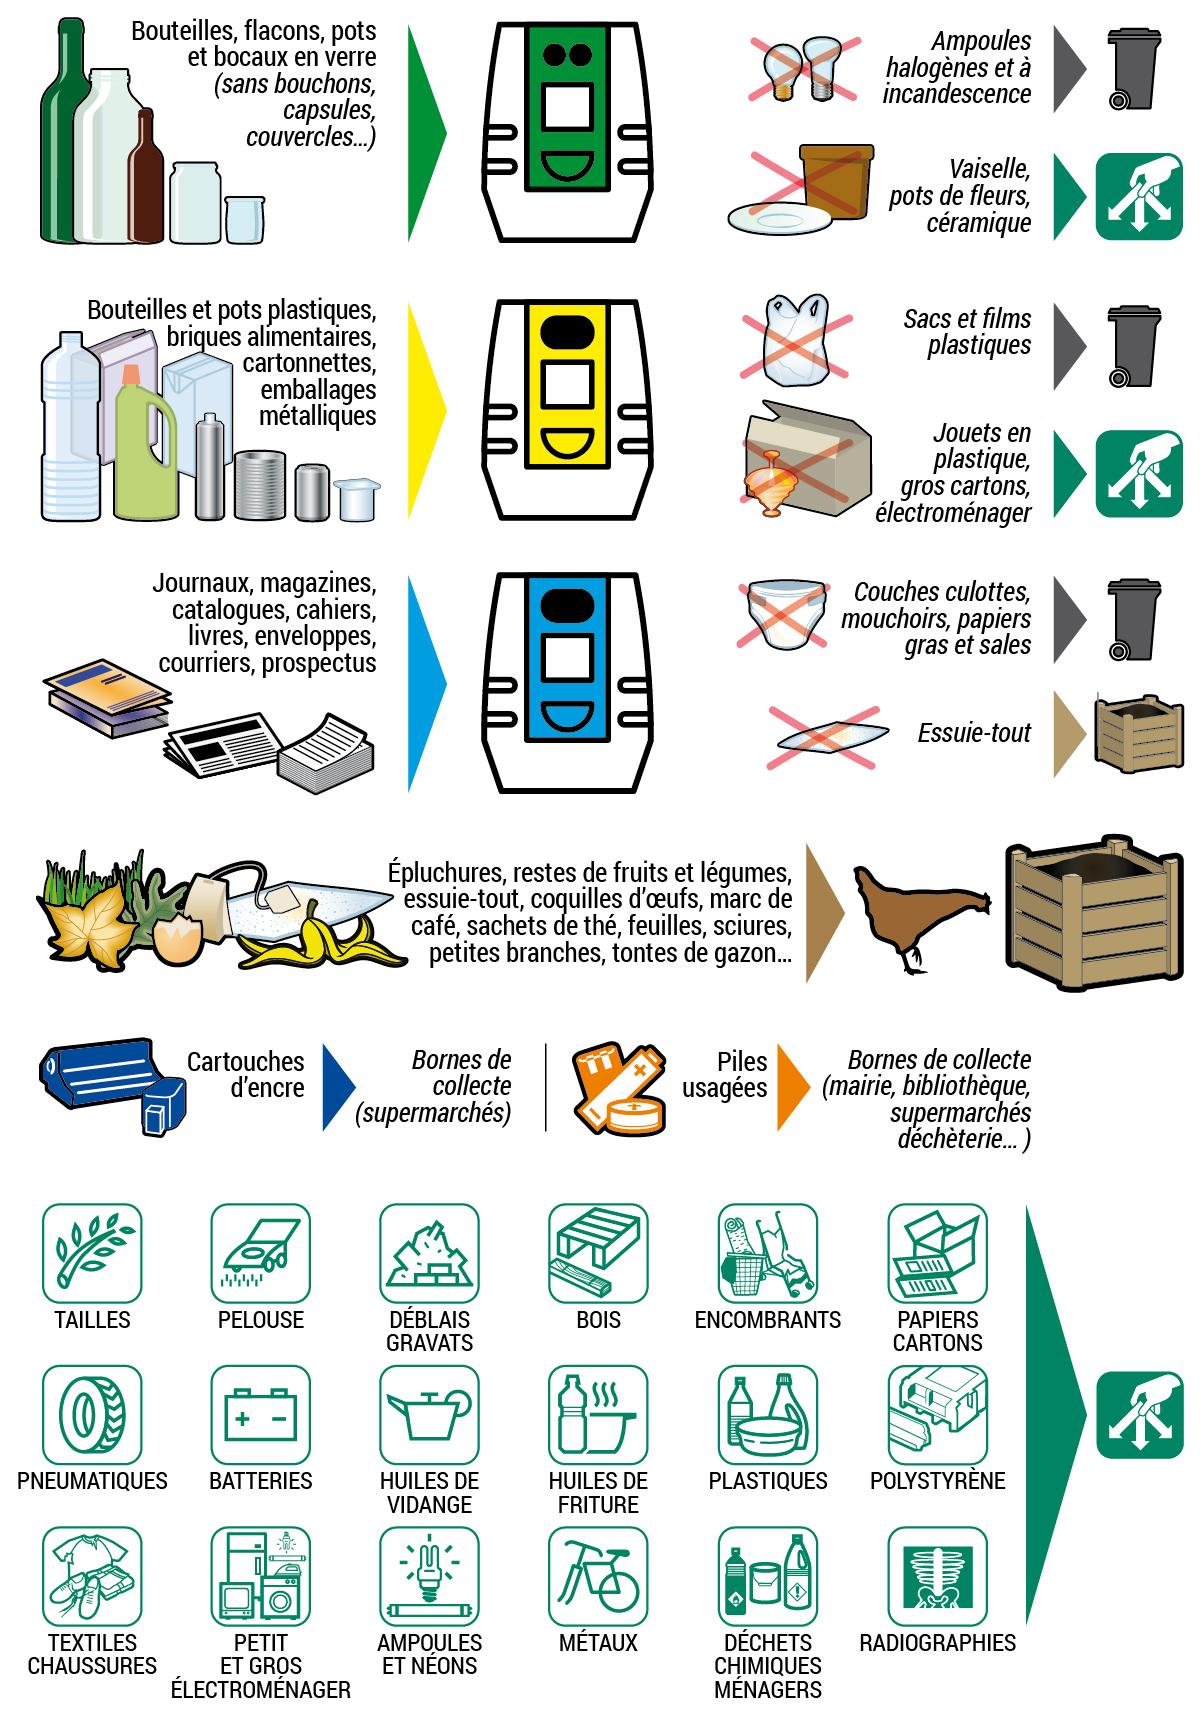 consignes-recyclage-illustrees_2020.jpg